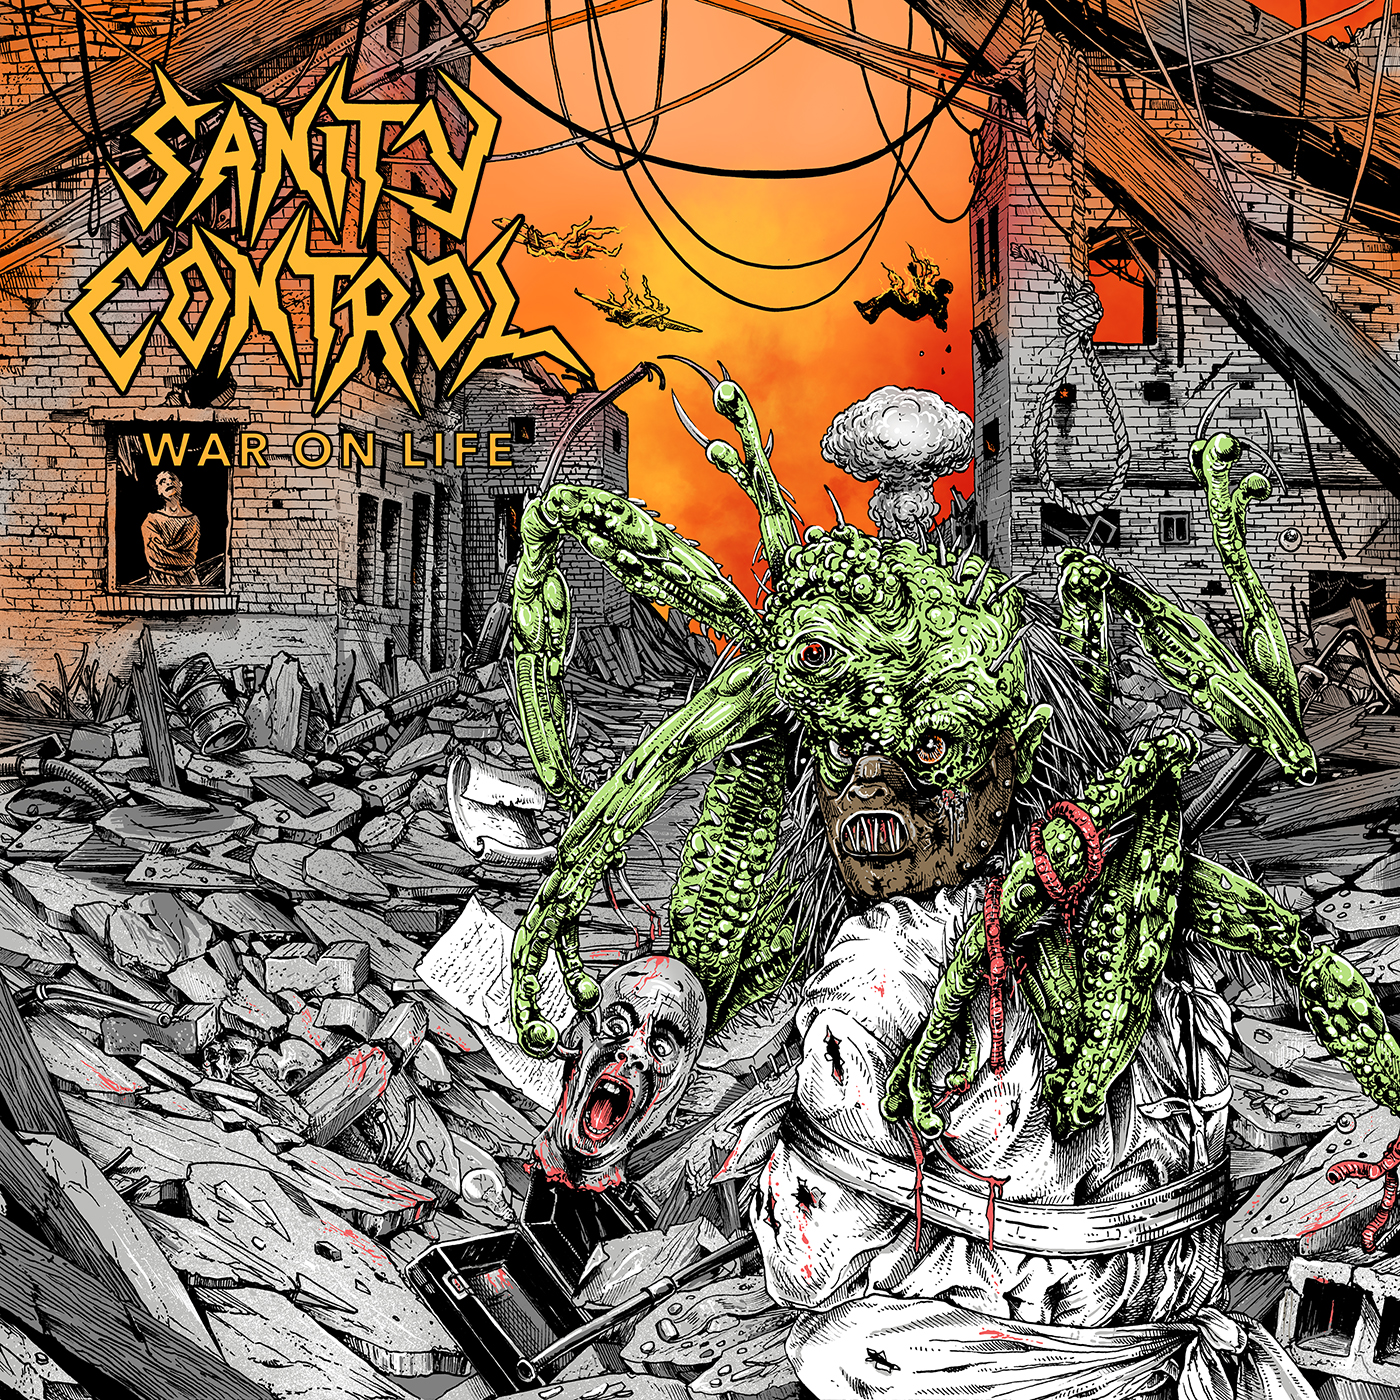 SANITY CONTROL - War On Life